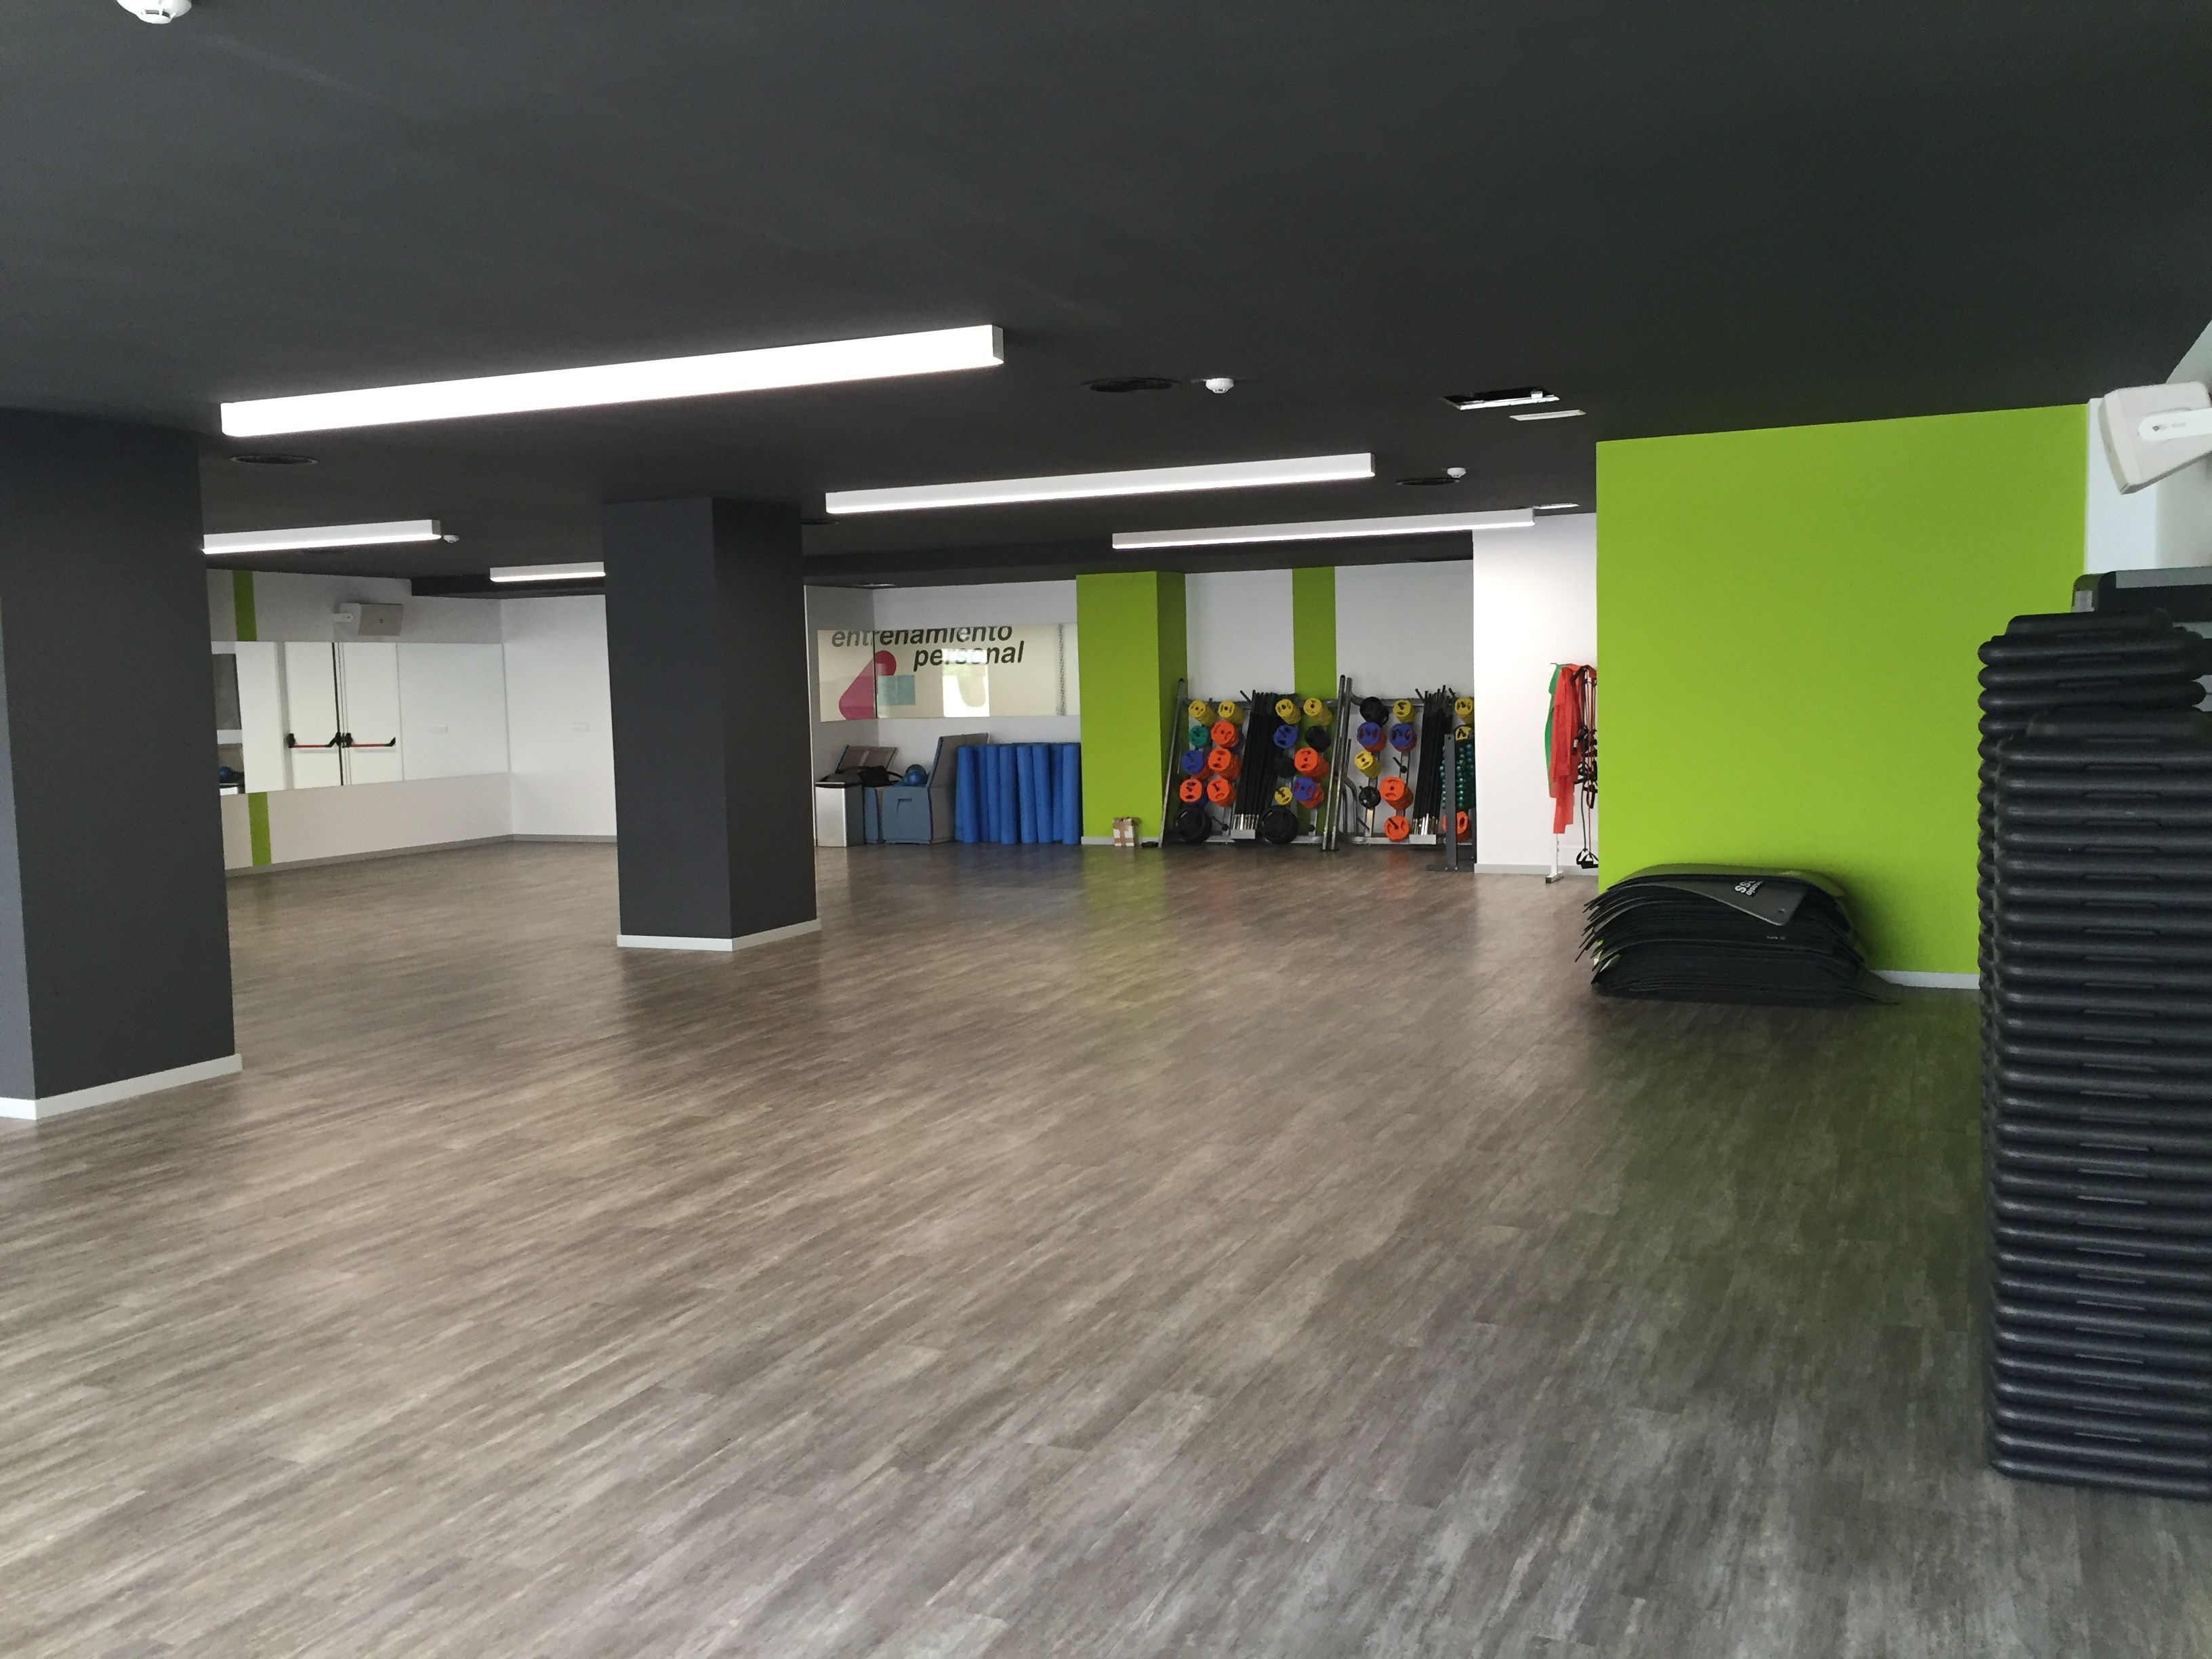 Sala De Clases Dirigidas Ifitness Benidorm Gimnasio Sala Multiuso Decoracao